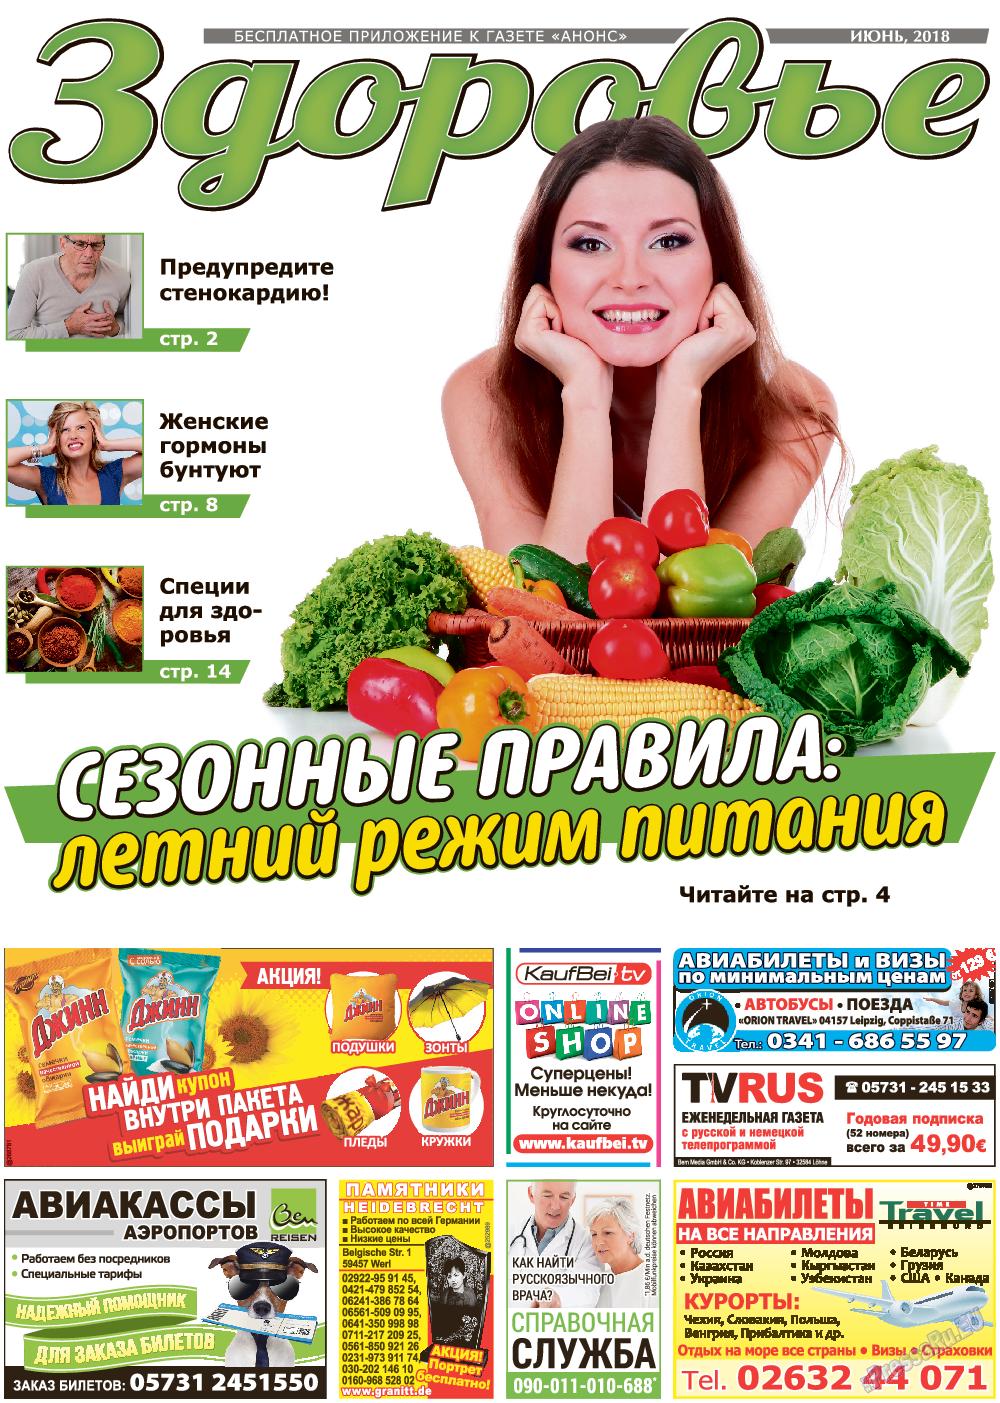 Здоровье (газета). 2018 год, номер 6, стр. 1